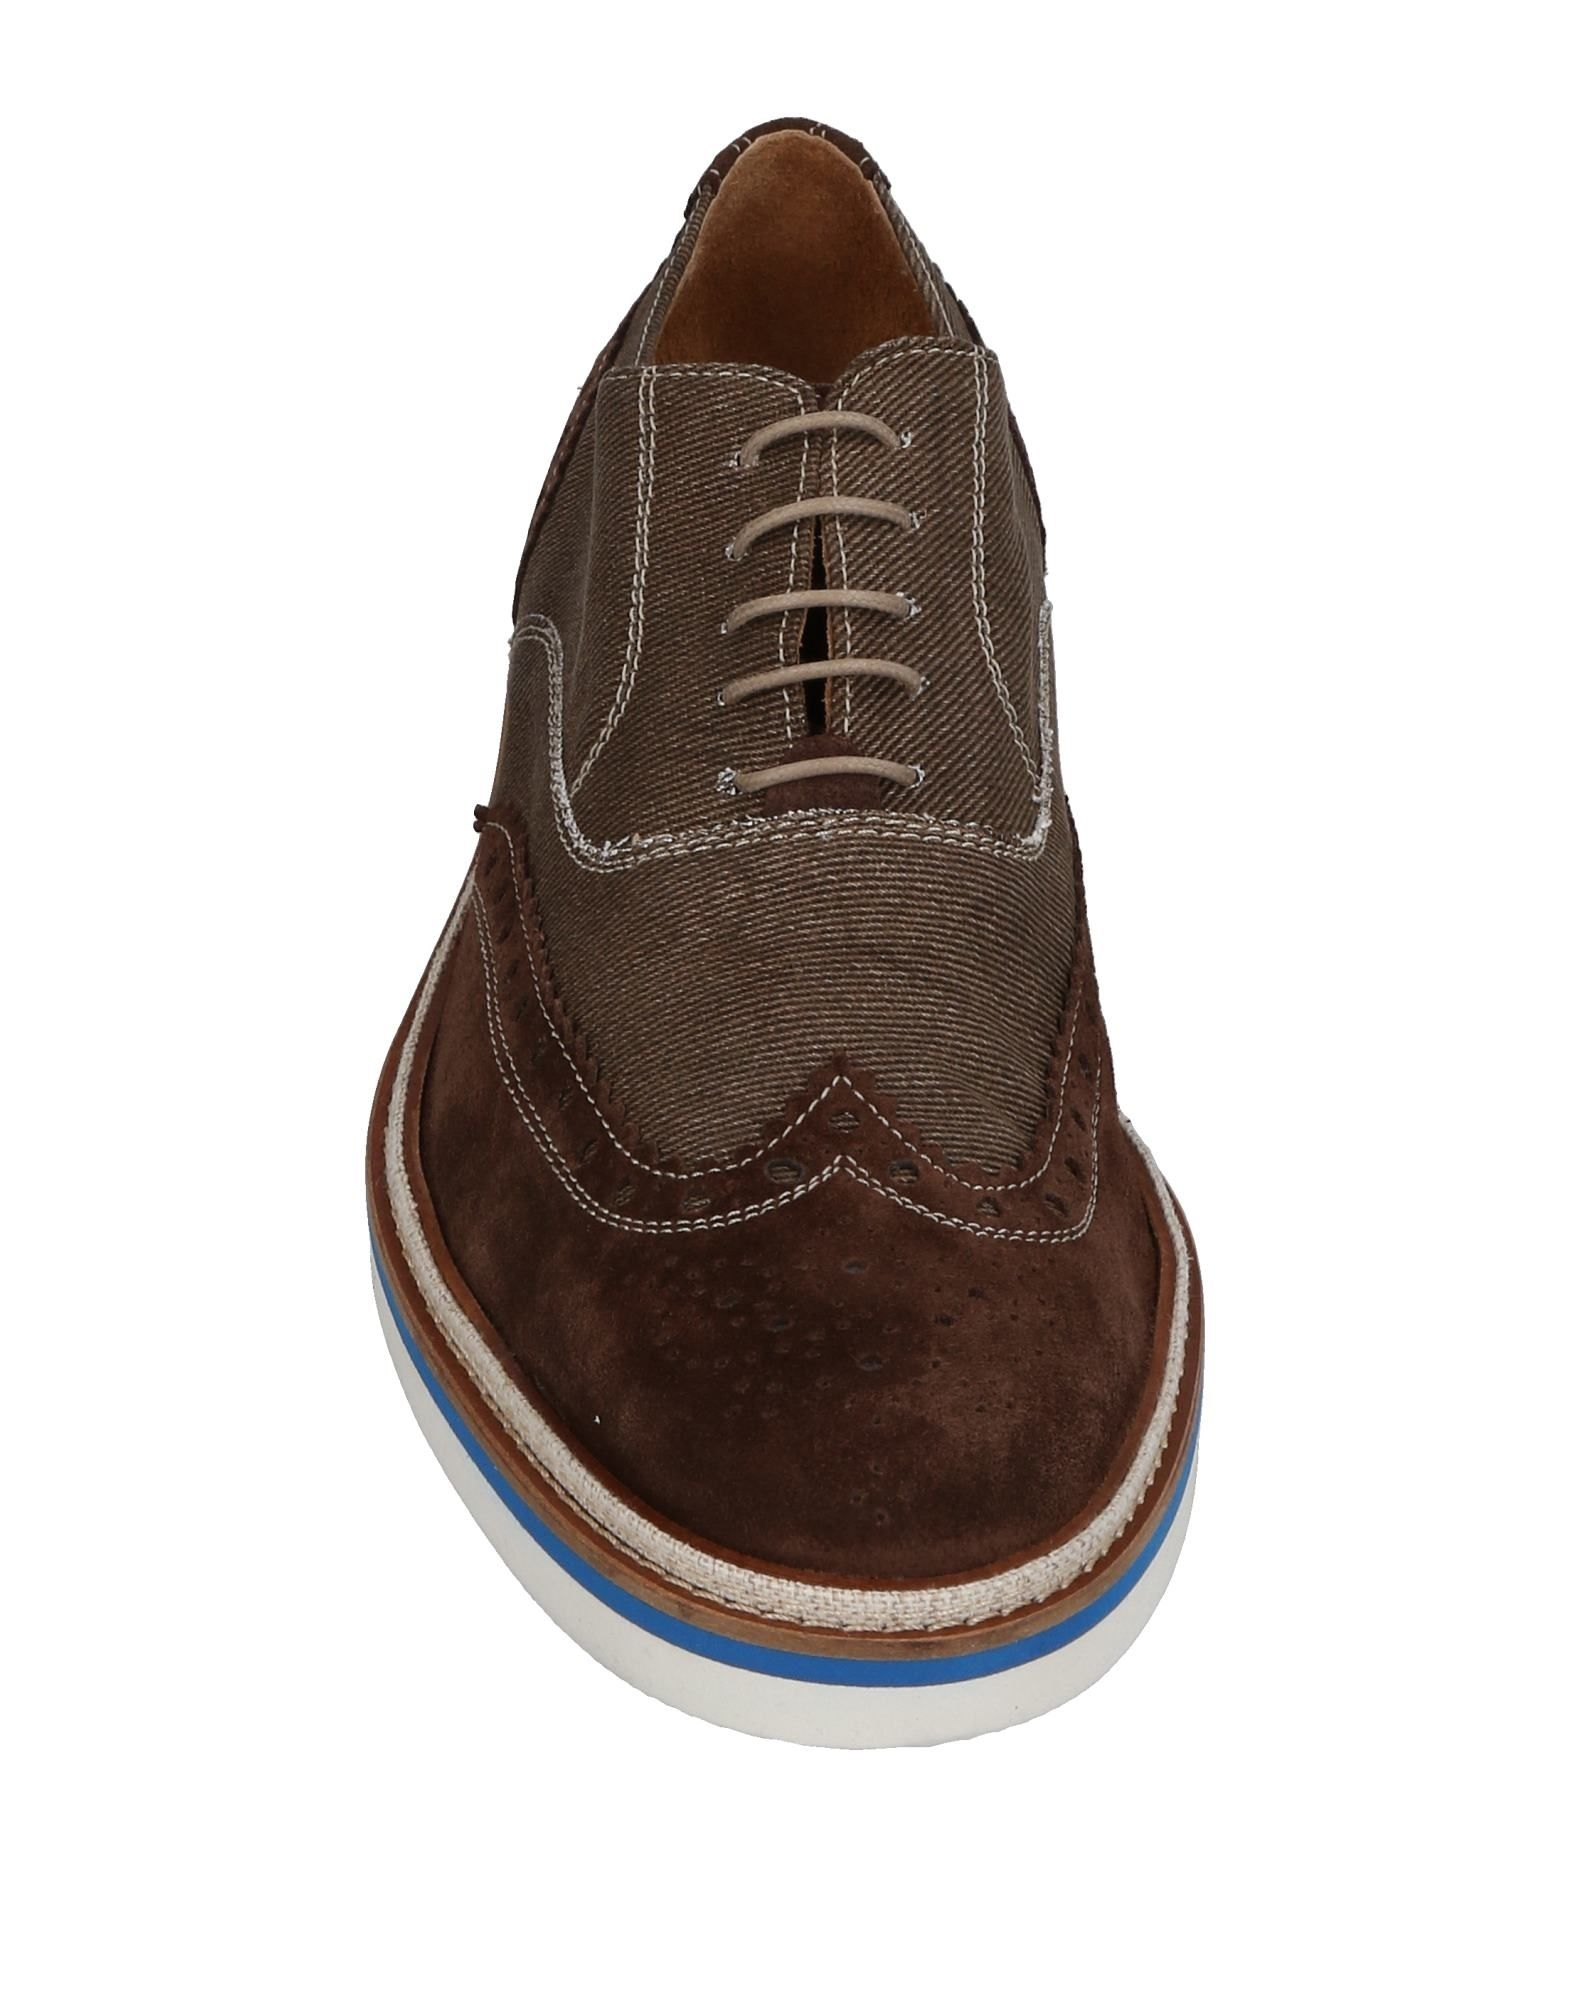 Gold Brothers Schnürschuhe Schuhe Herren  11396690EP Neue Schuhe Schnürschuhe e1c01b